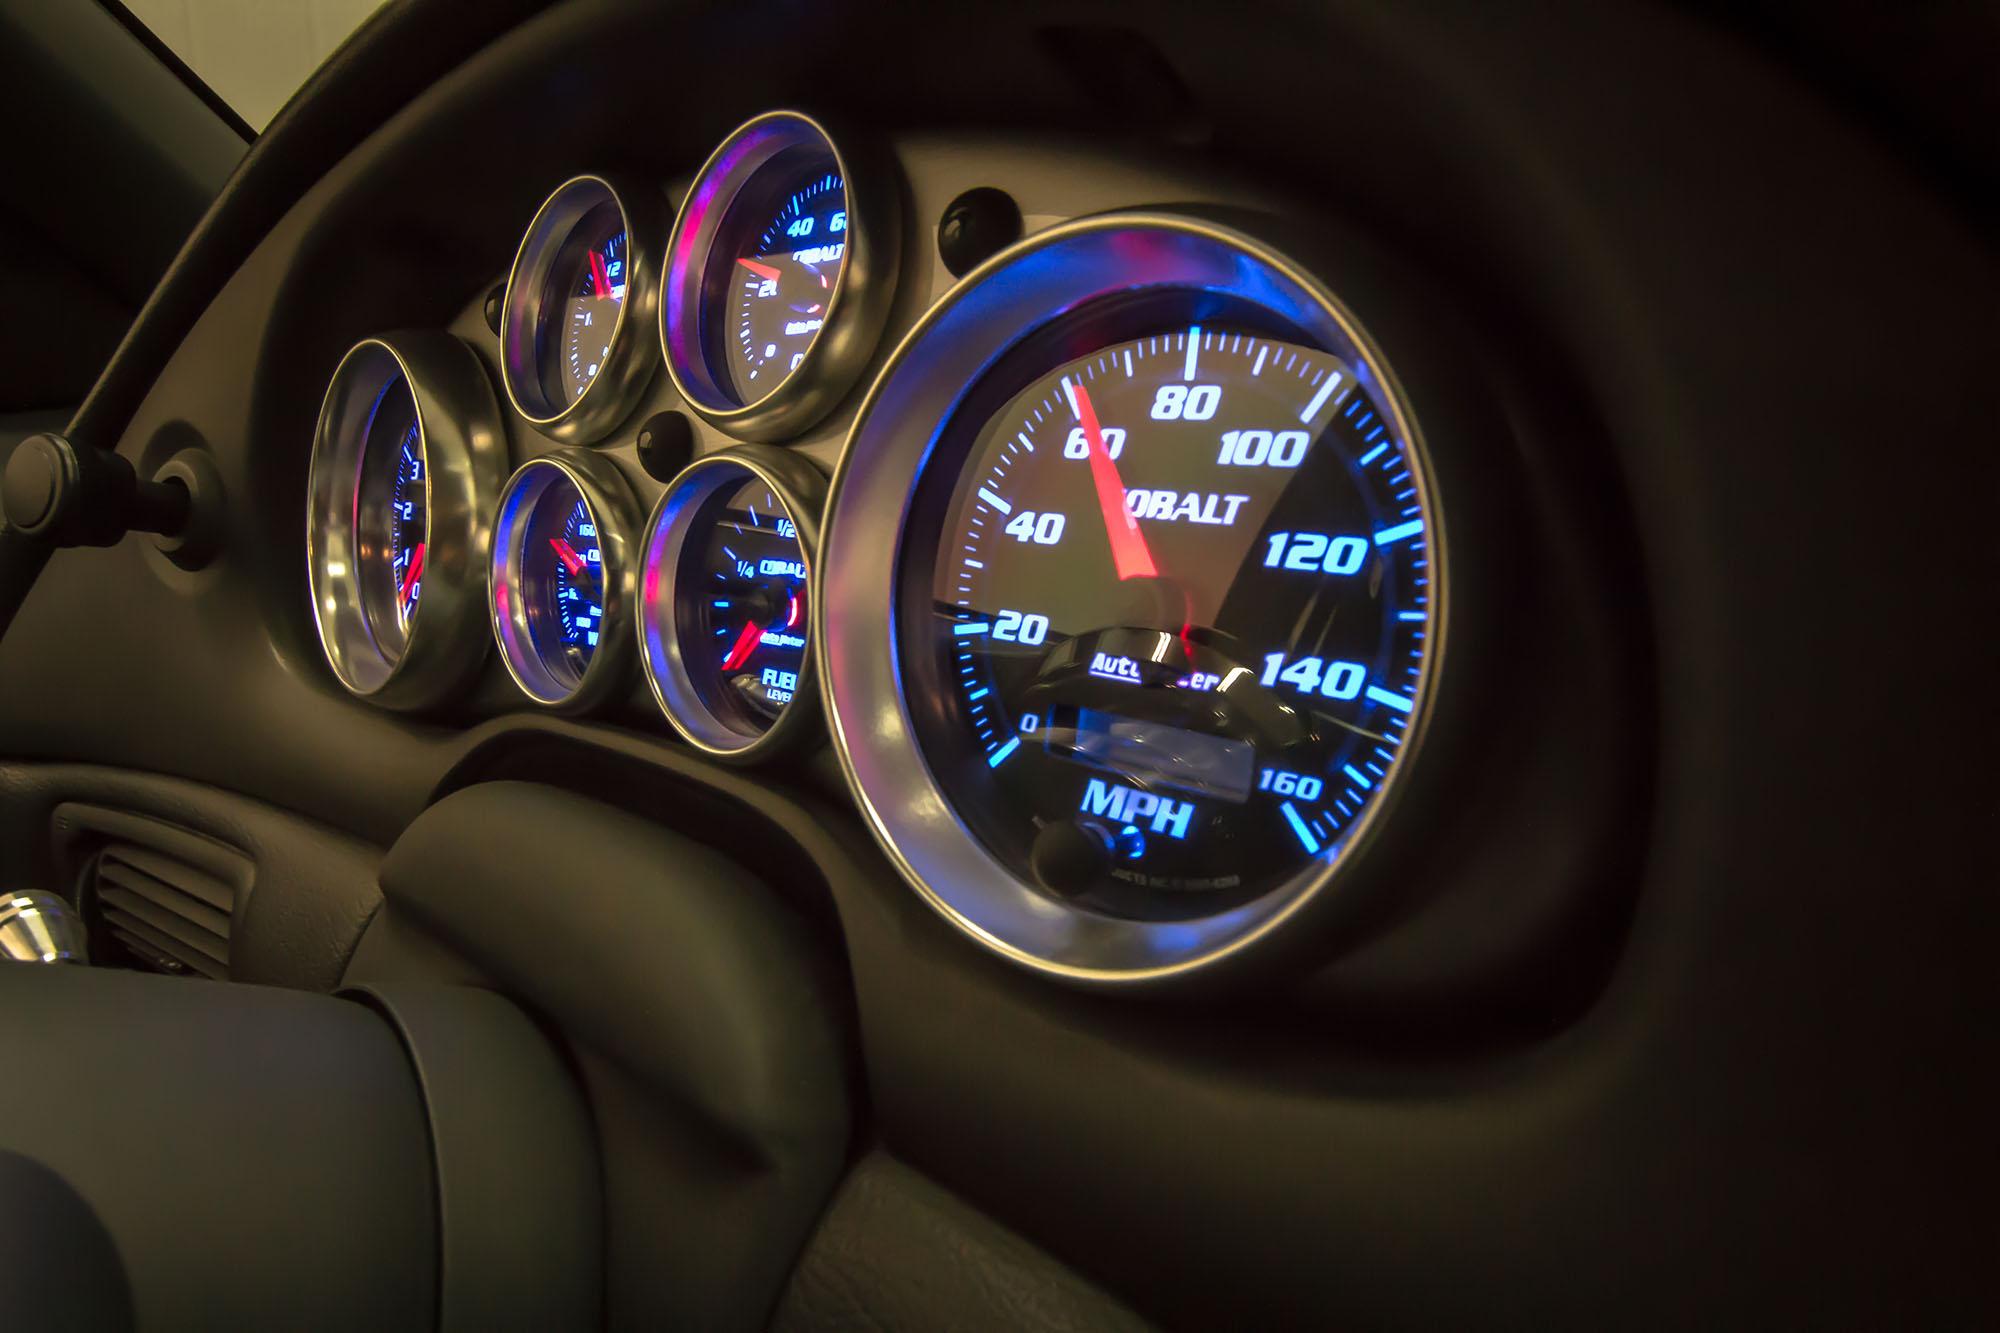 1991 Notchback Mustang instrment cluster